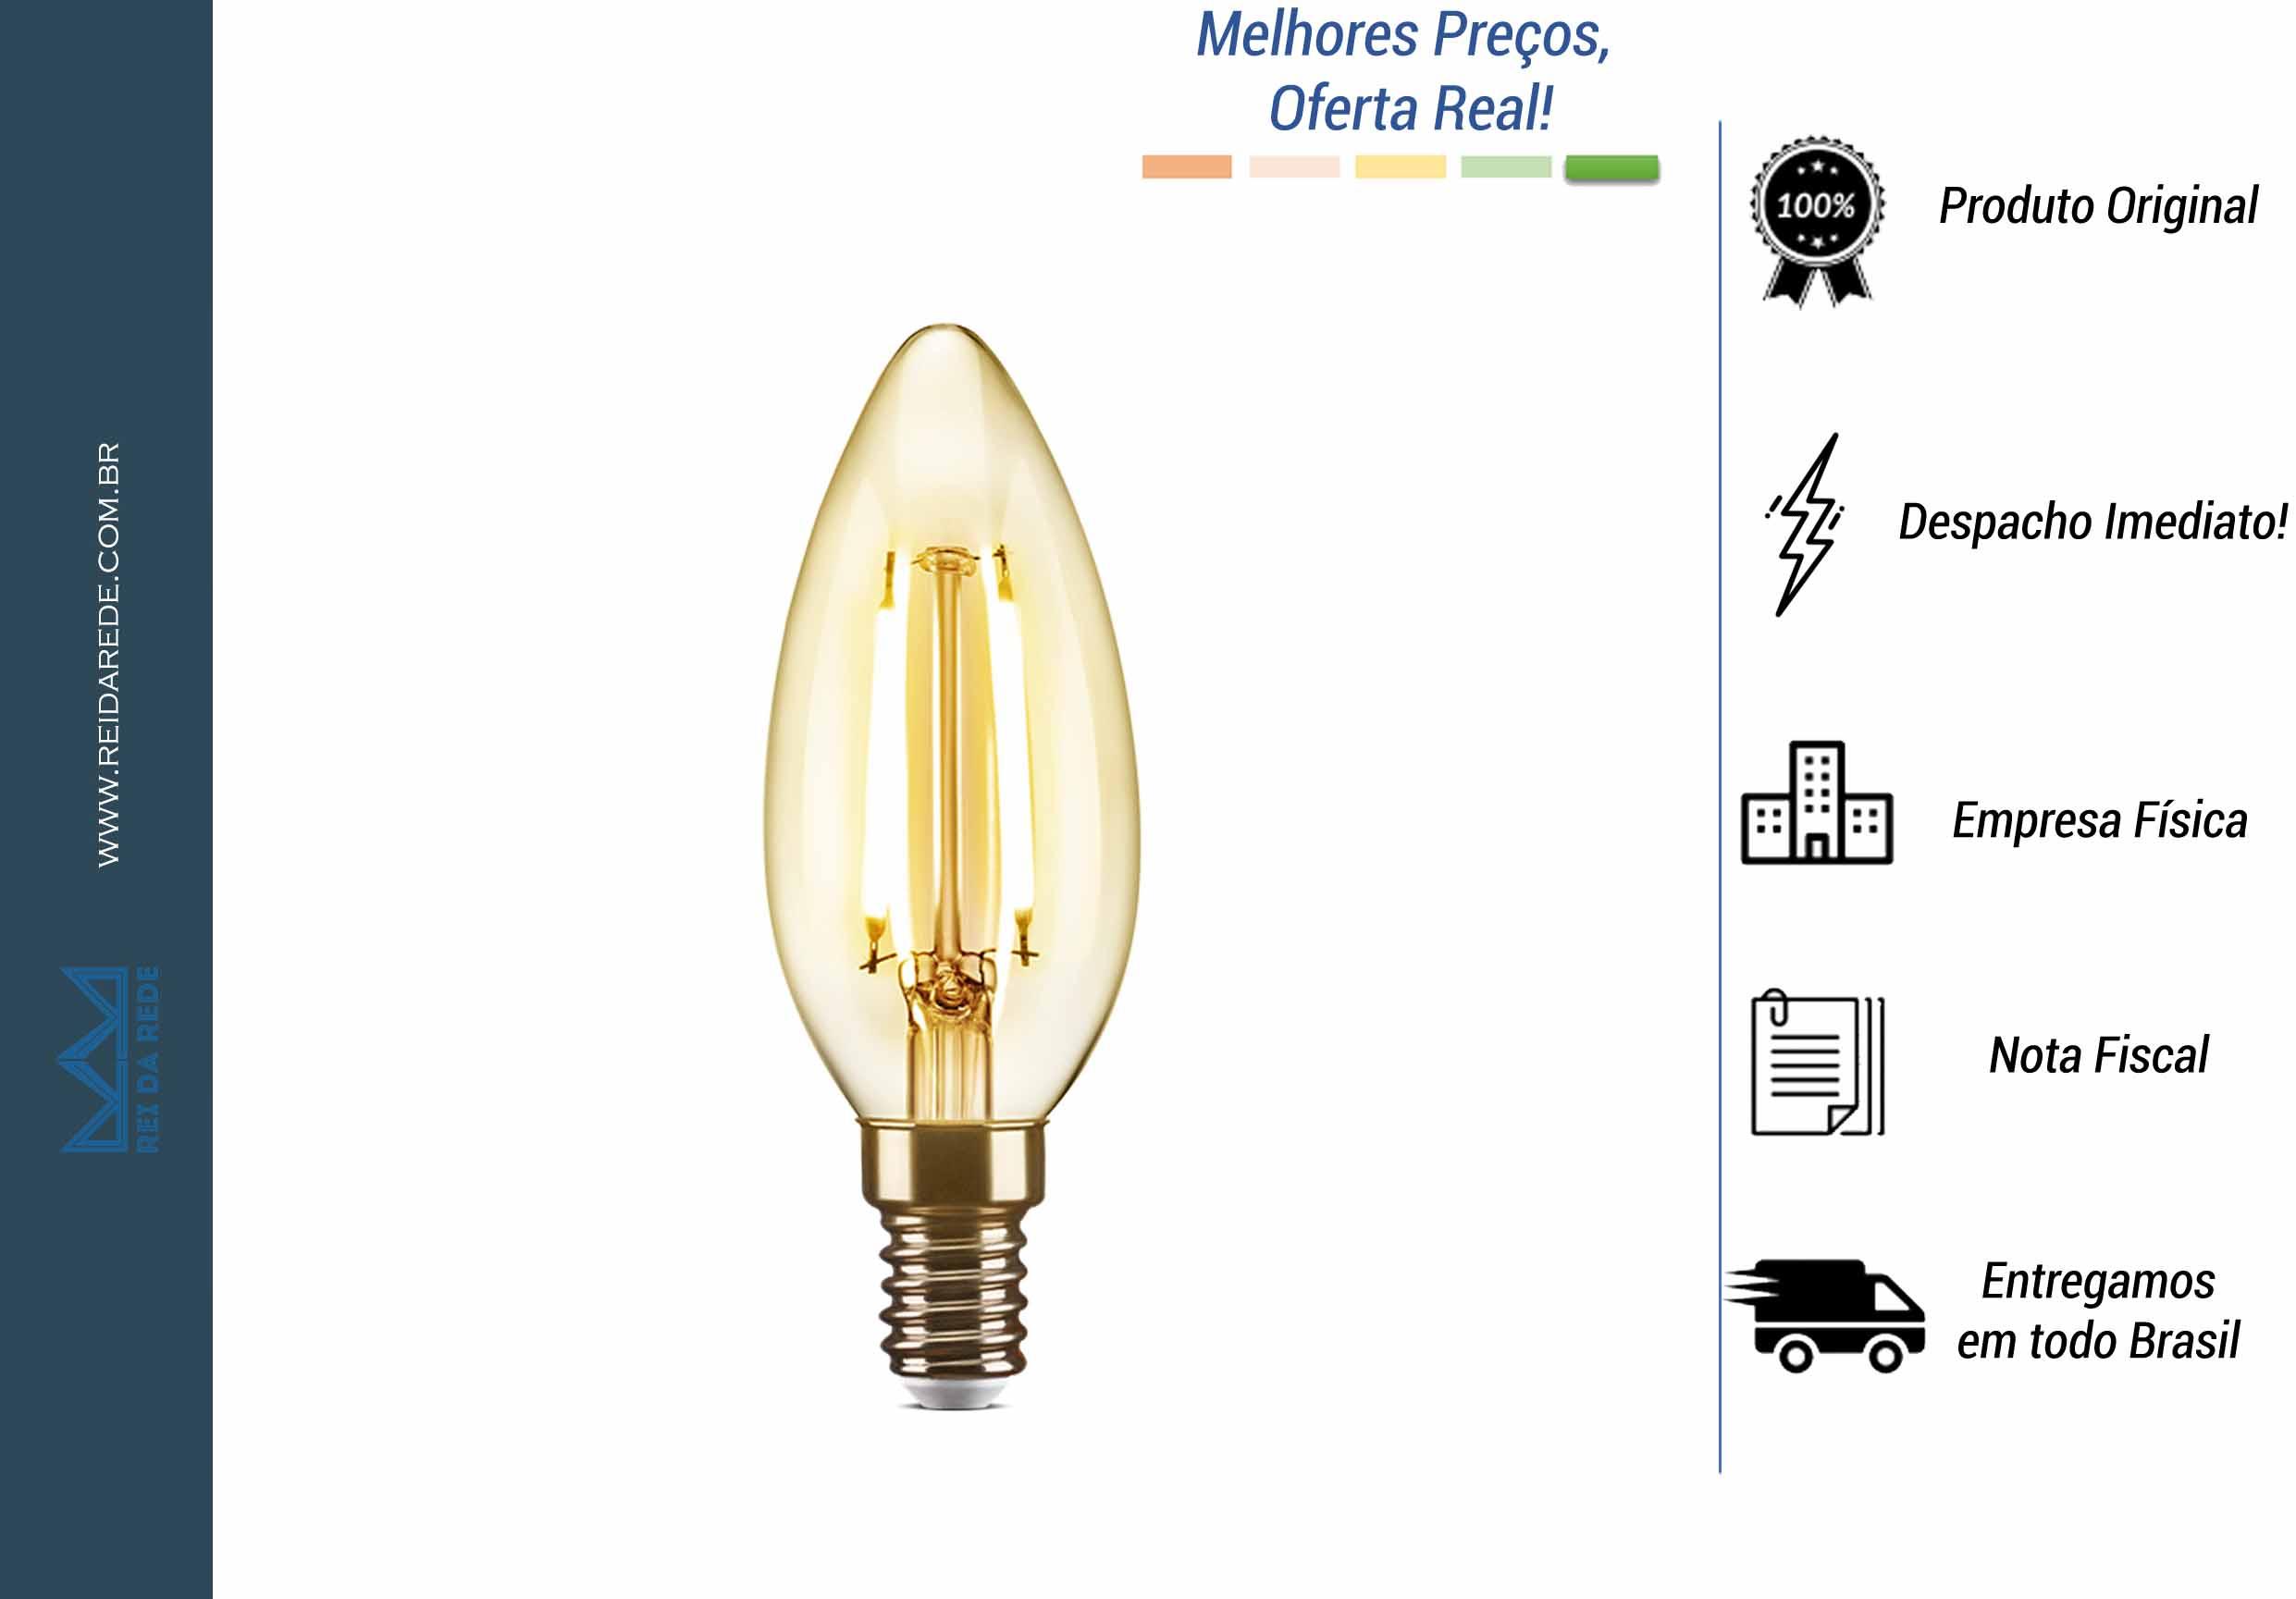 LÂMPADA LED DE FILAMENTO VELA CHAMA LUZ ÂMBAR 2W AVANT 127V (110V) 48LC35F02A10 ELGIN - MARCA: ELGIN - MODELO: 48LC35F02A10